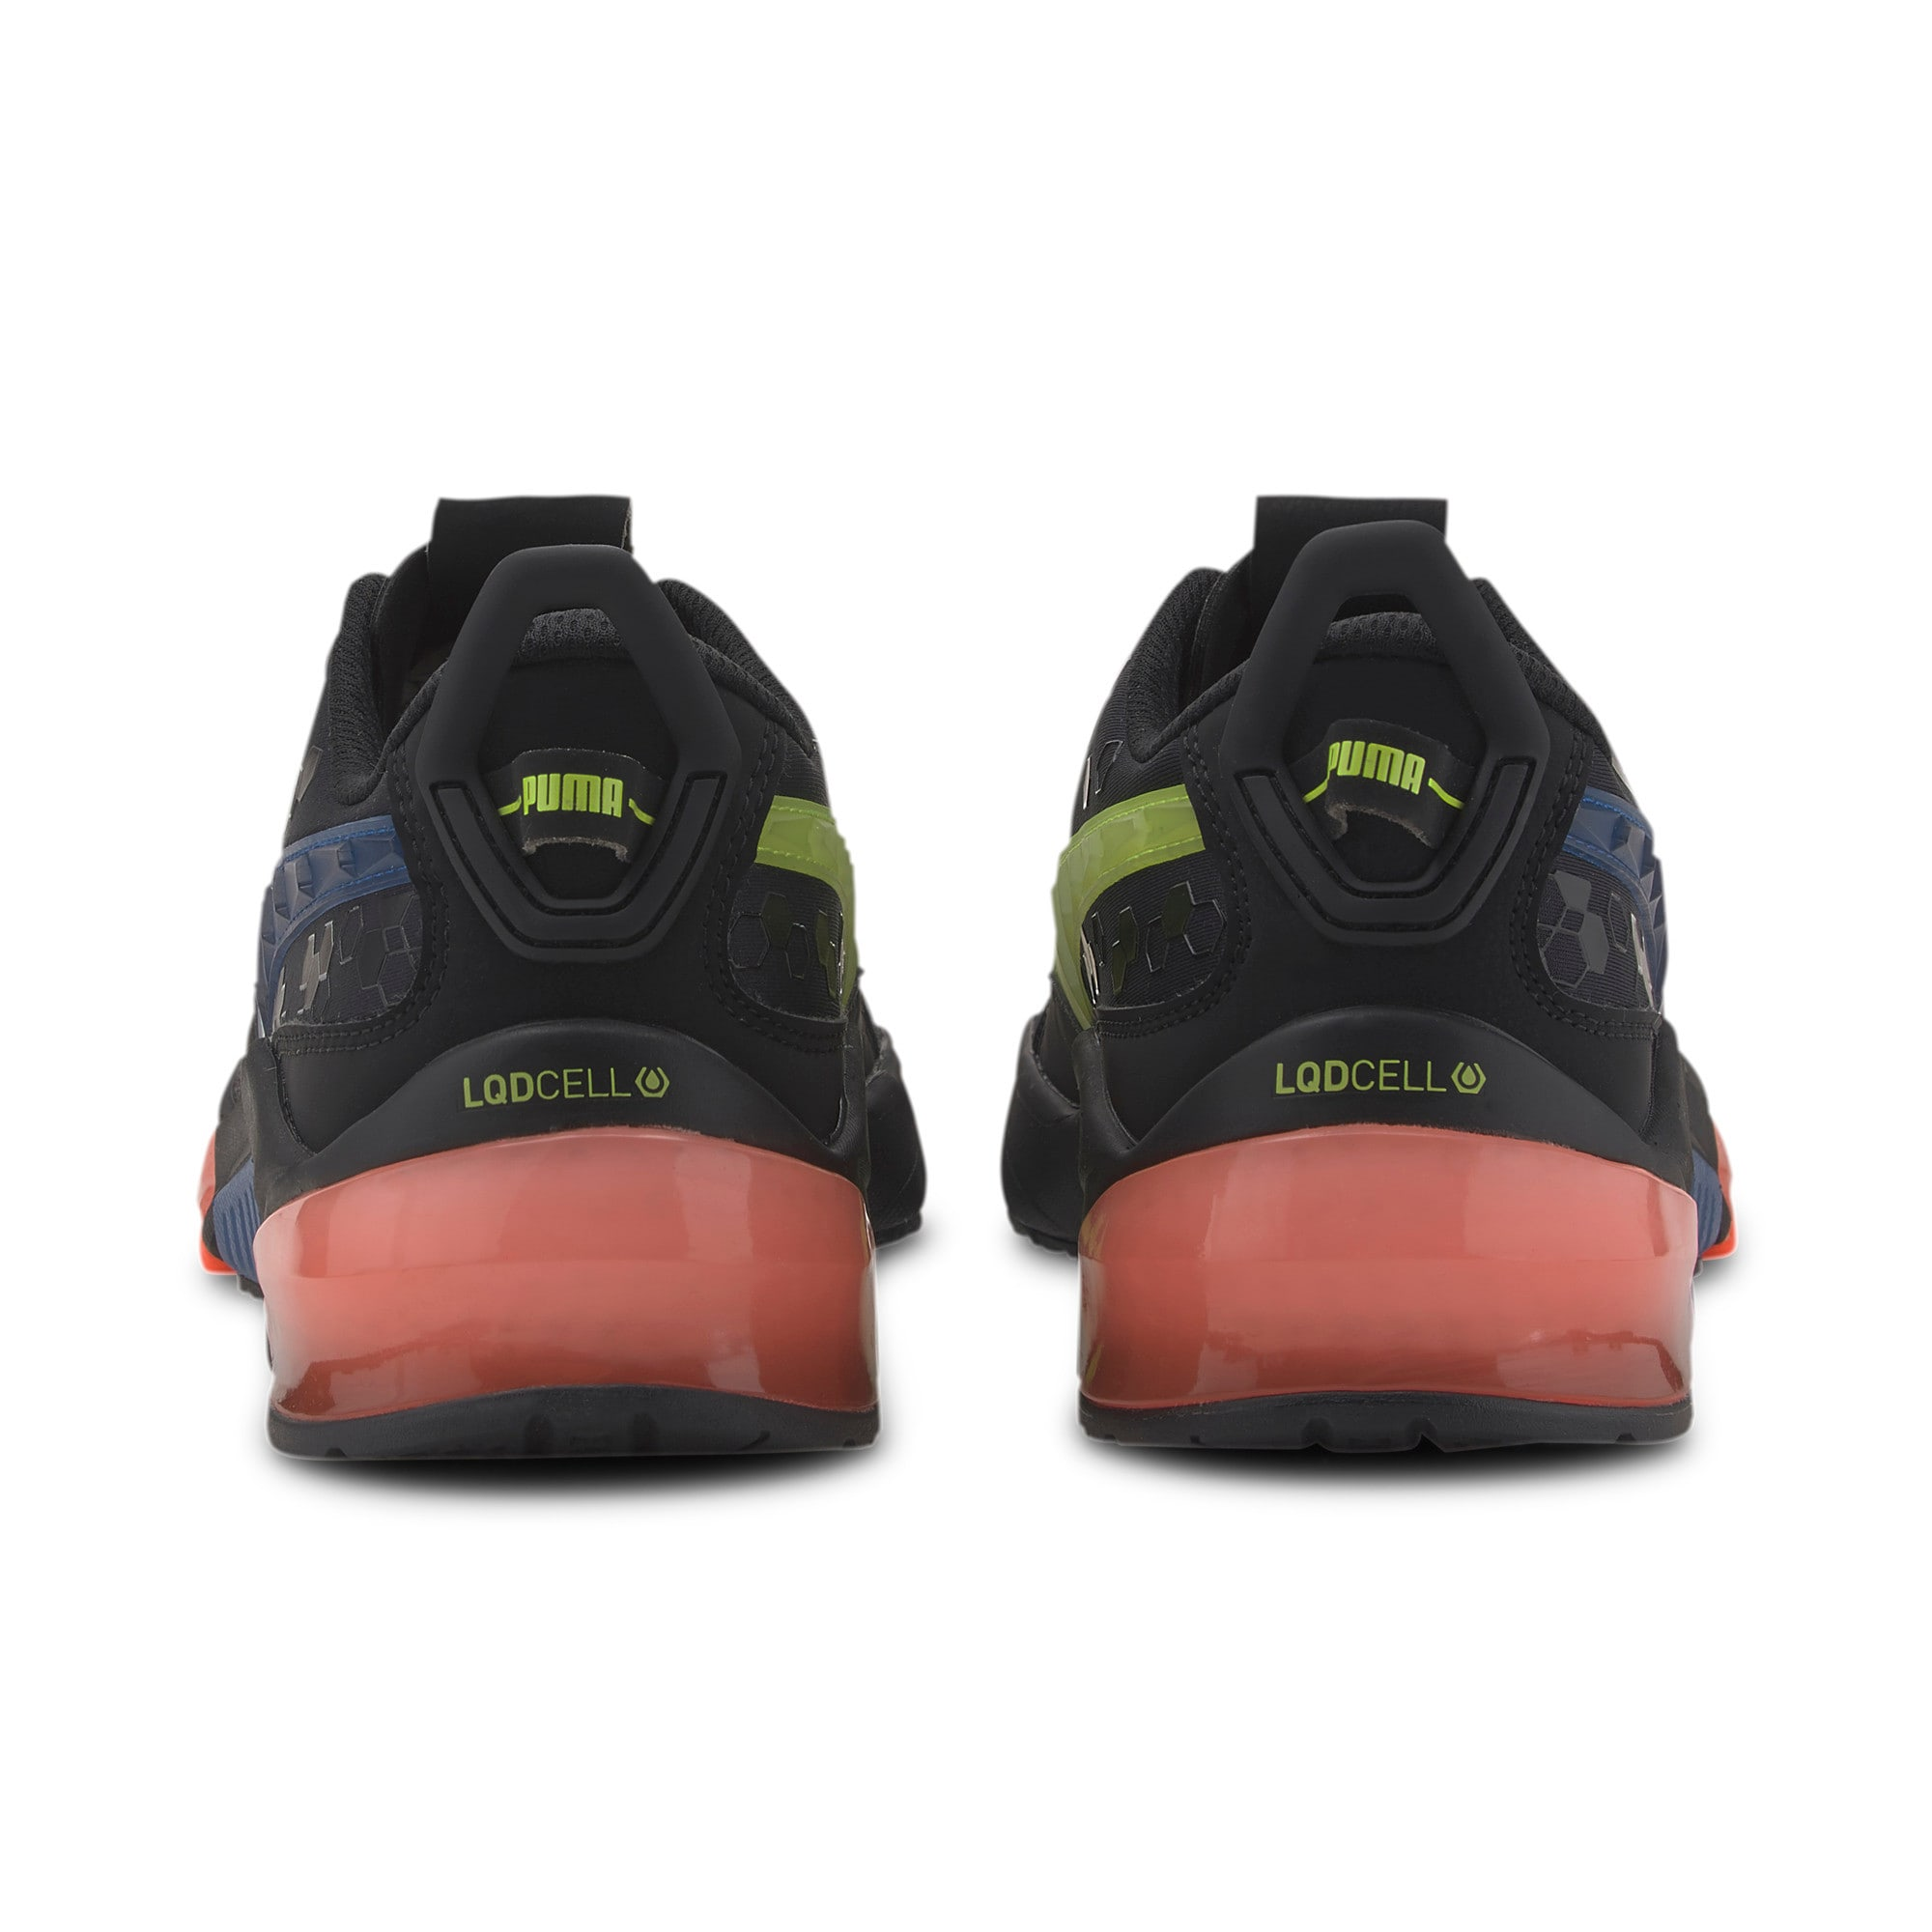 Thumbnail 3 of LQDCELL Optic Training Shoes, Puma Black, medium